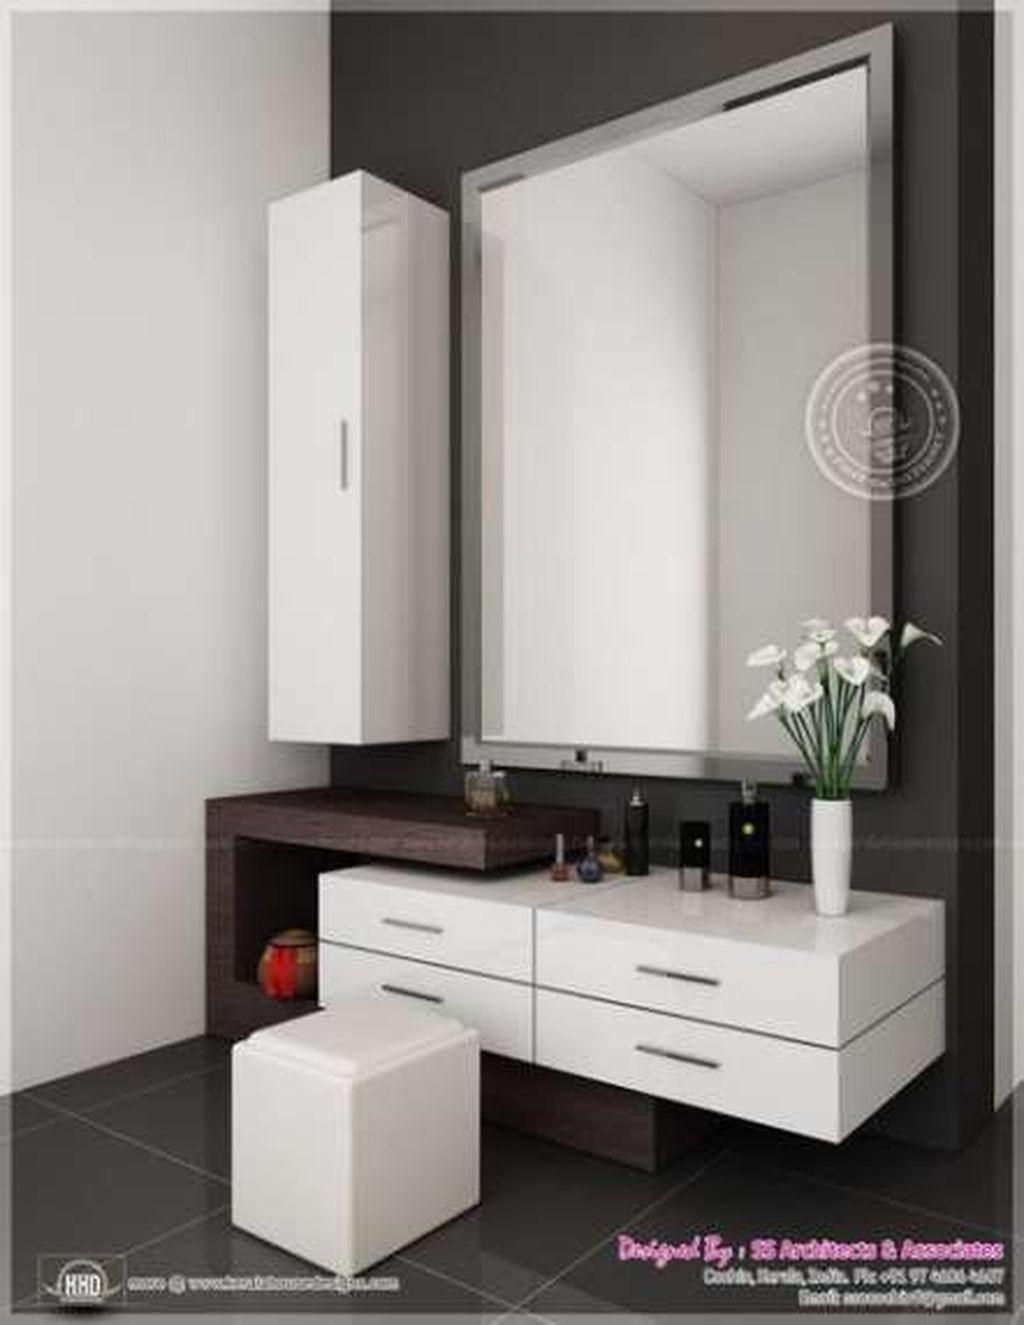 Room S By Tarun Jain In 2020 Dressing Table Design Dressing